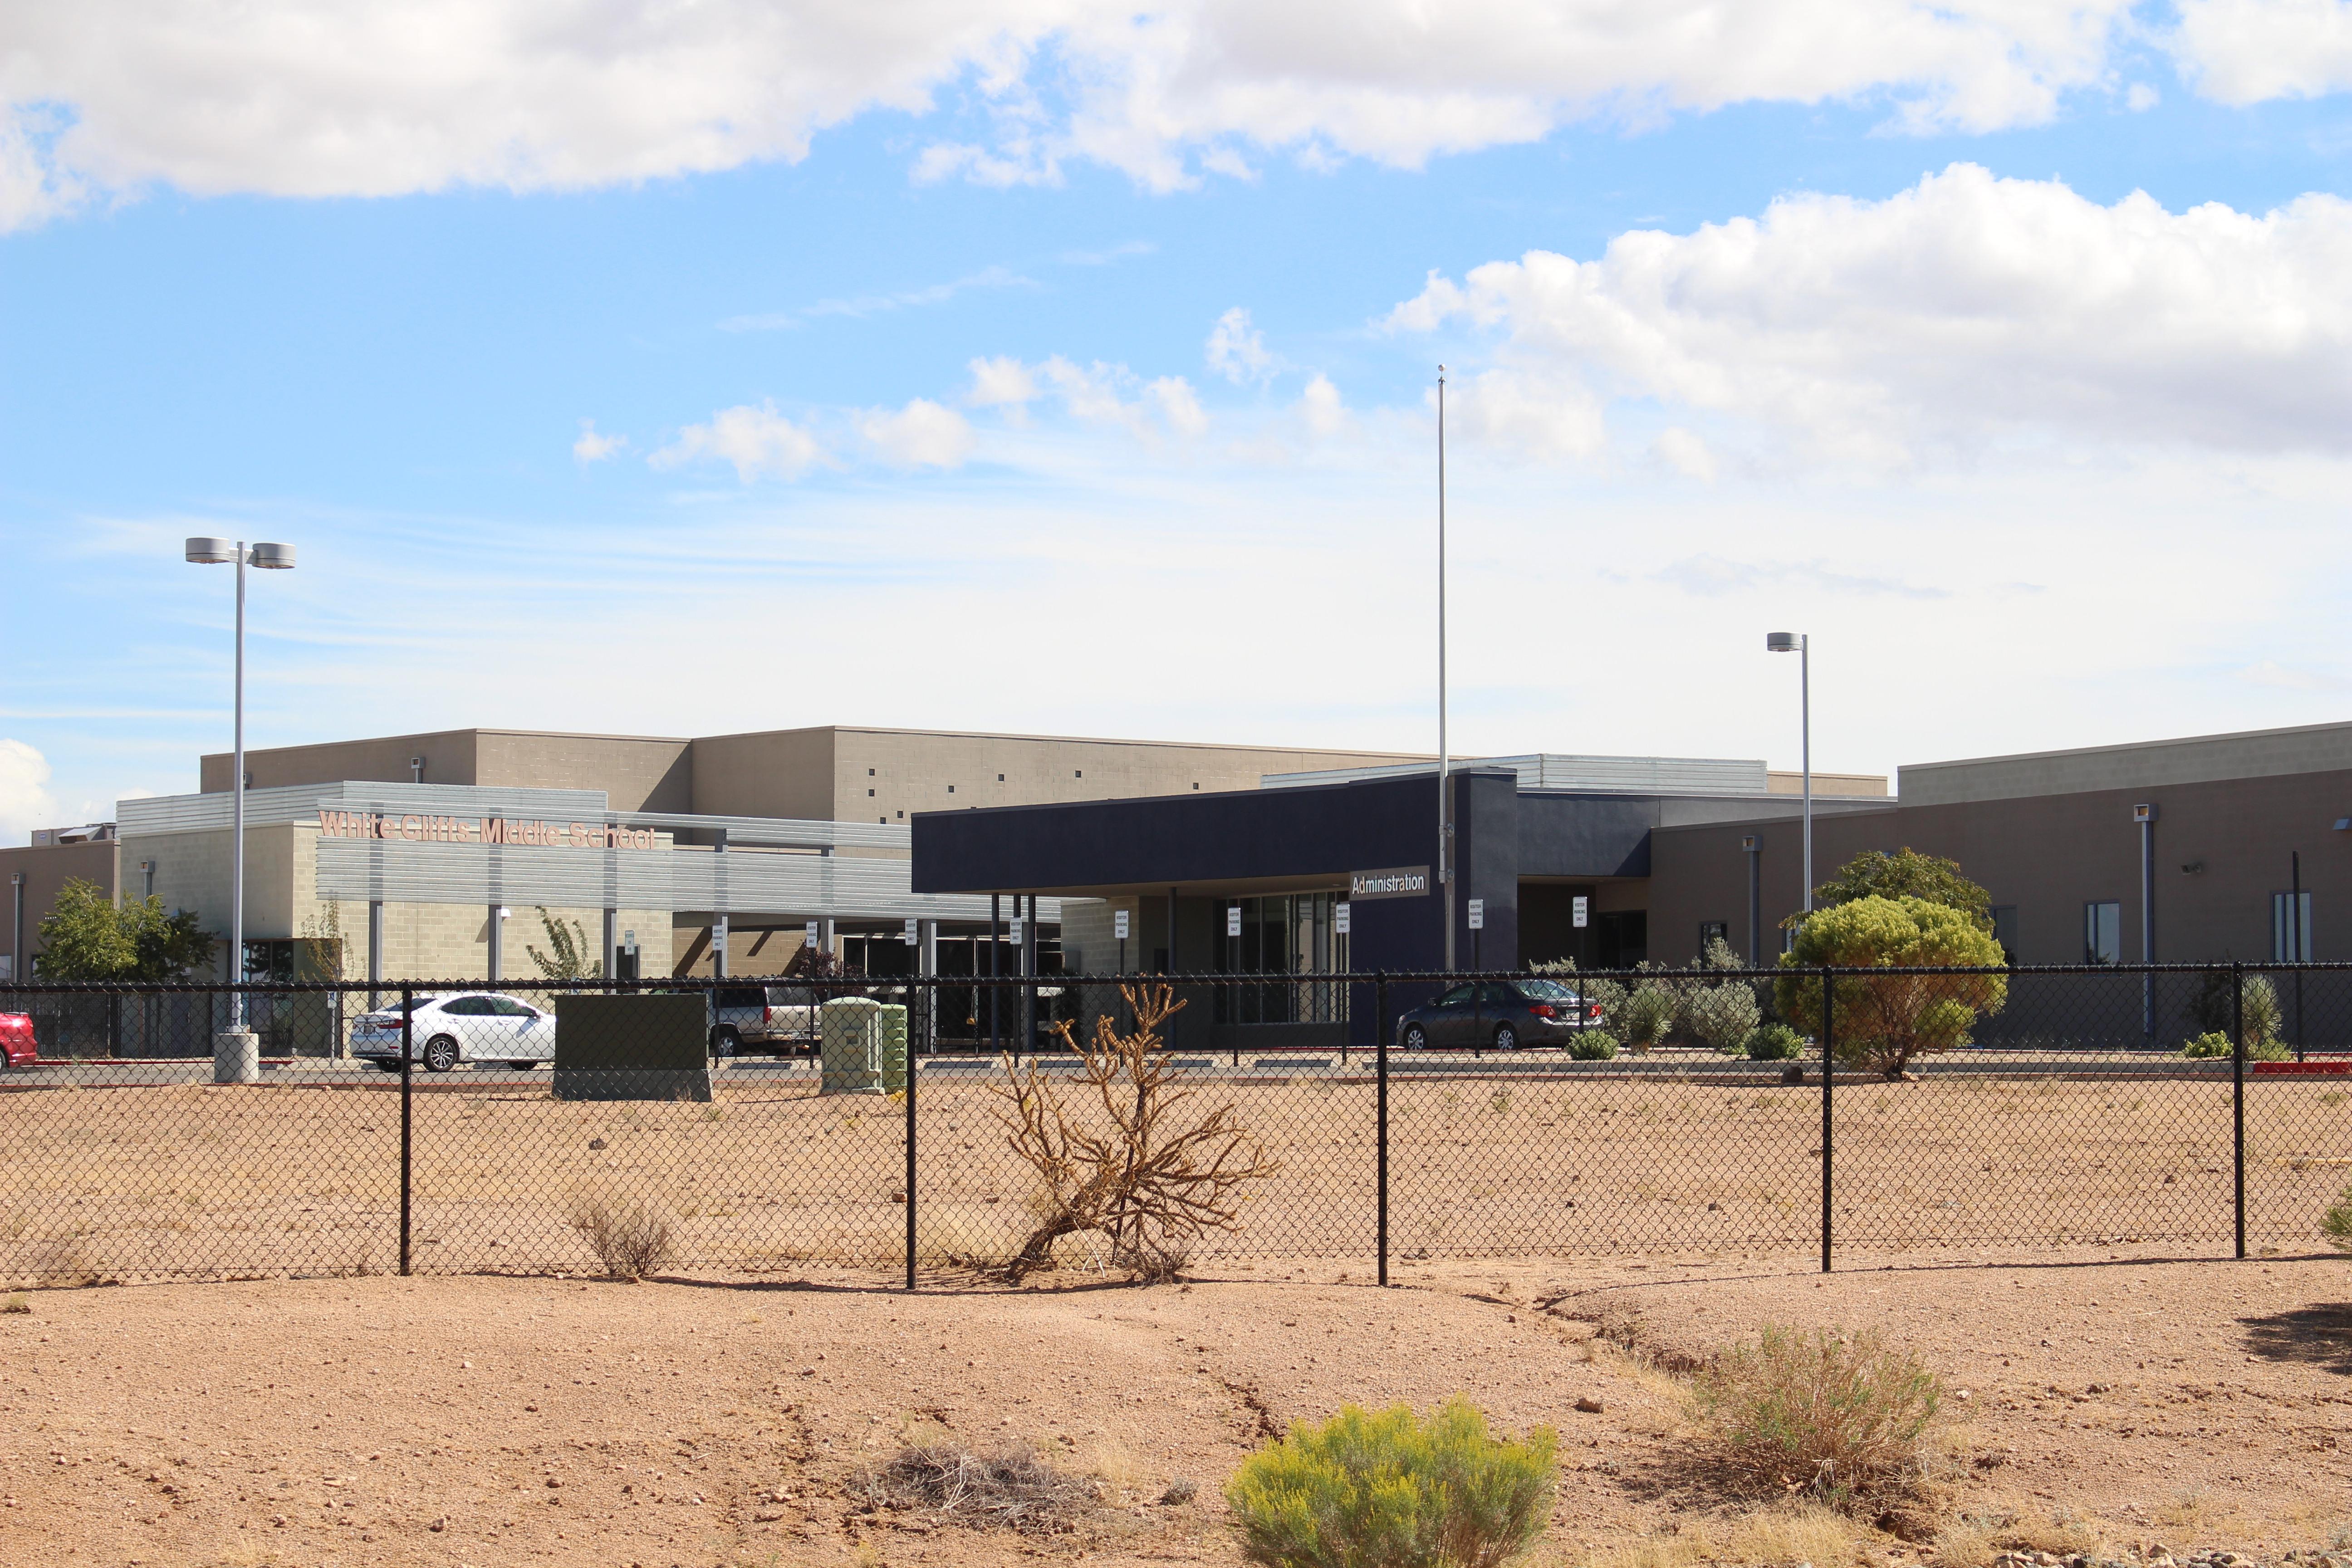 Trumpstock 2019   Kingman Daily Miner   Kingman, AZ